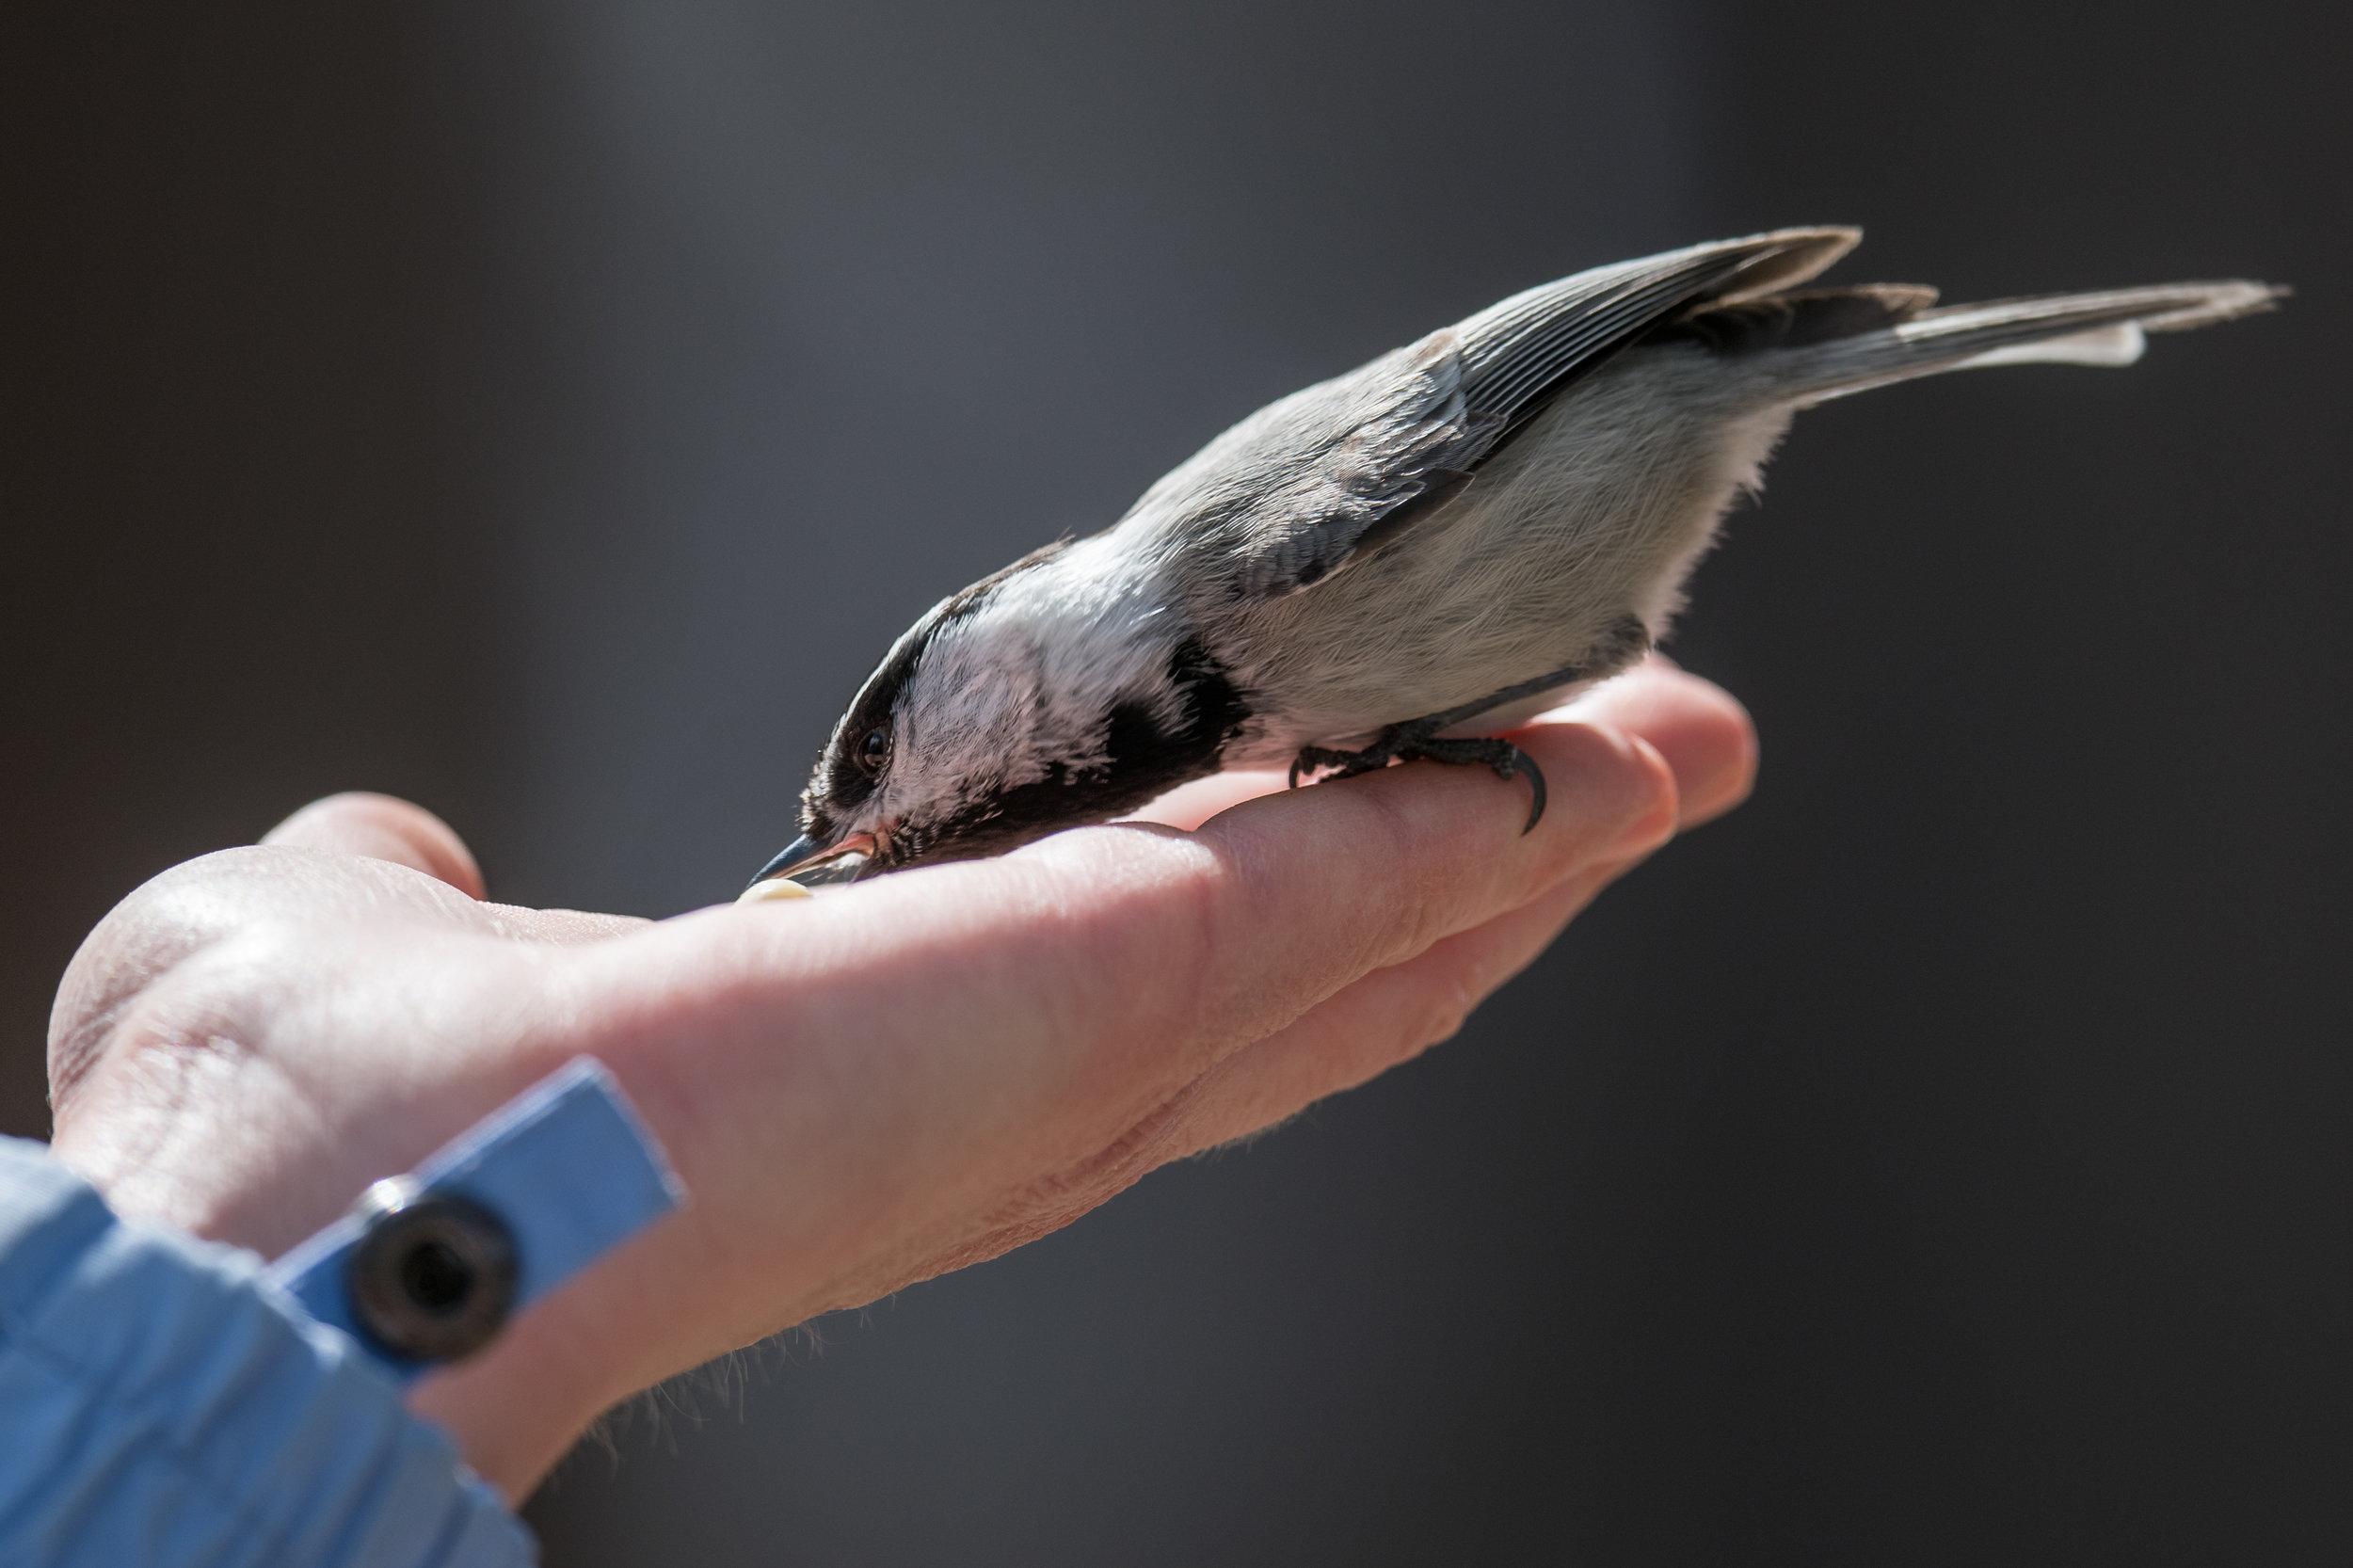 Bird in the Hand: What fun